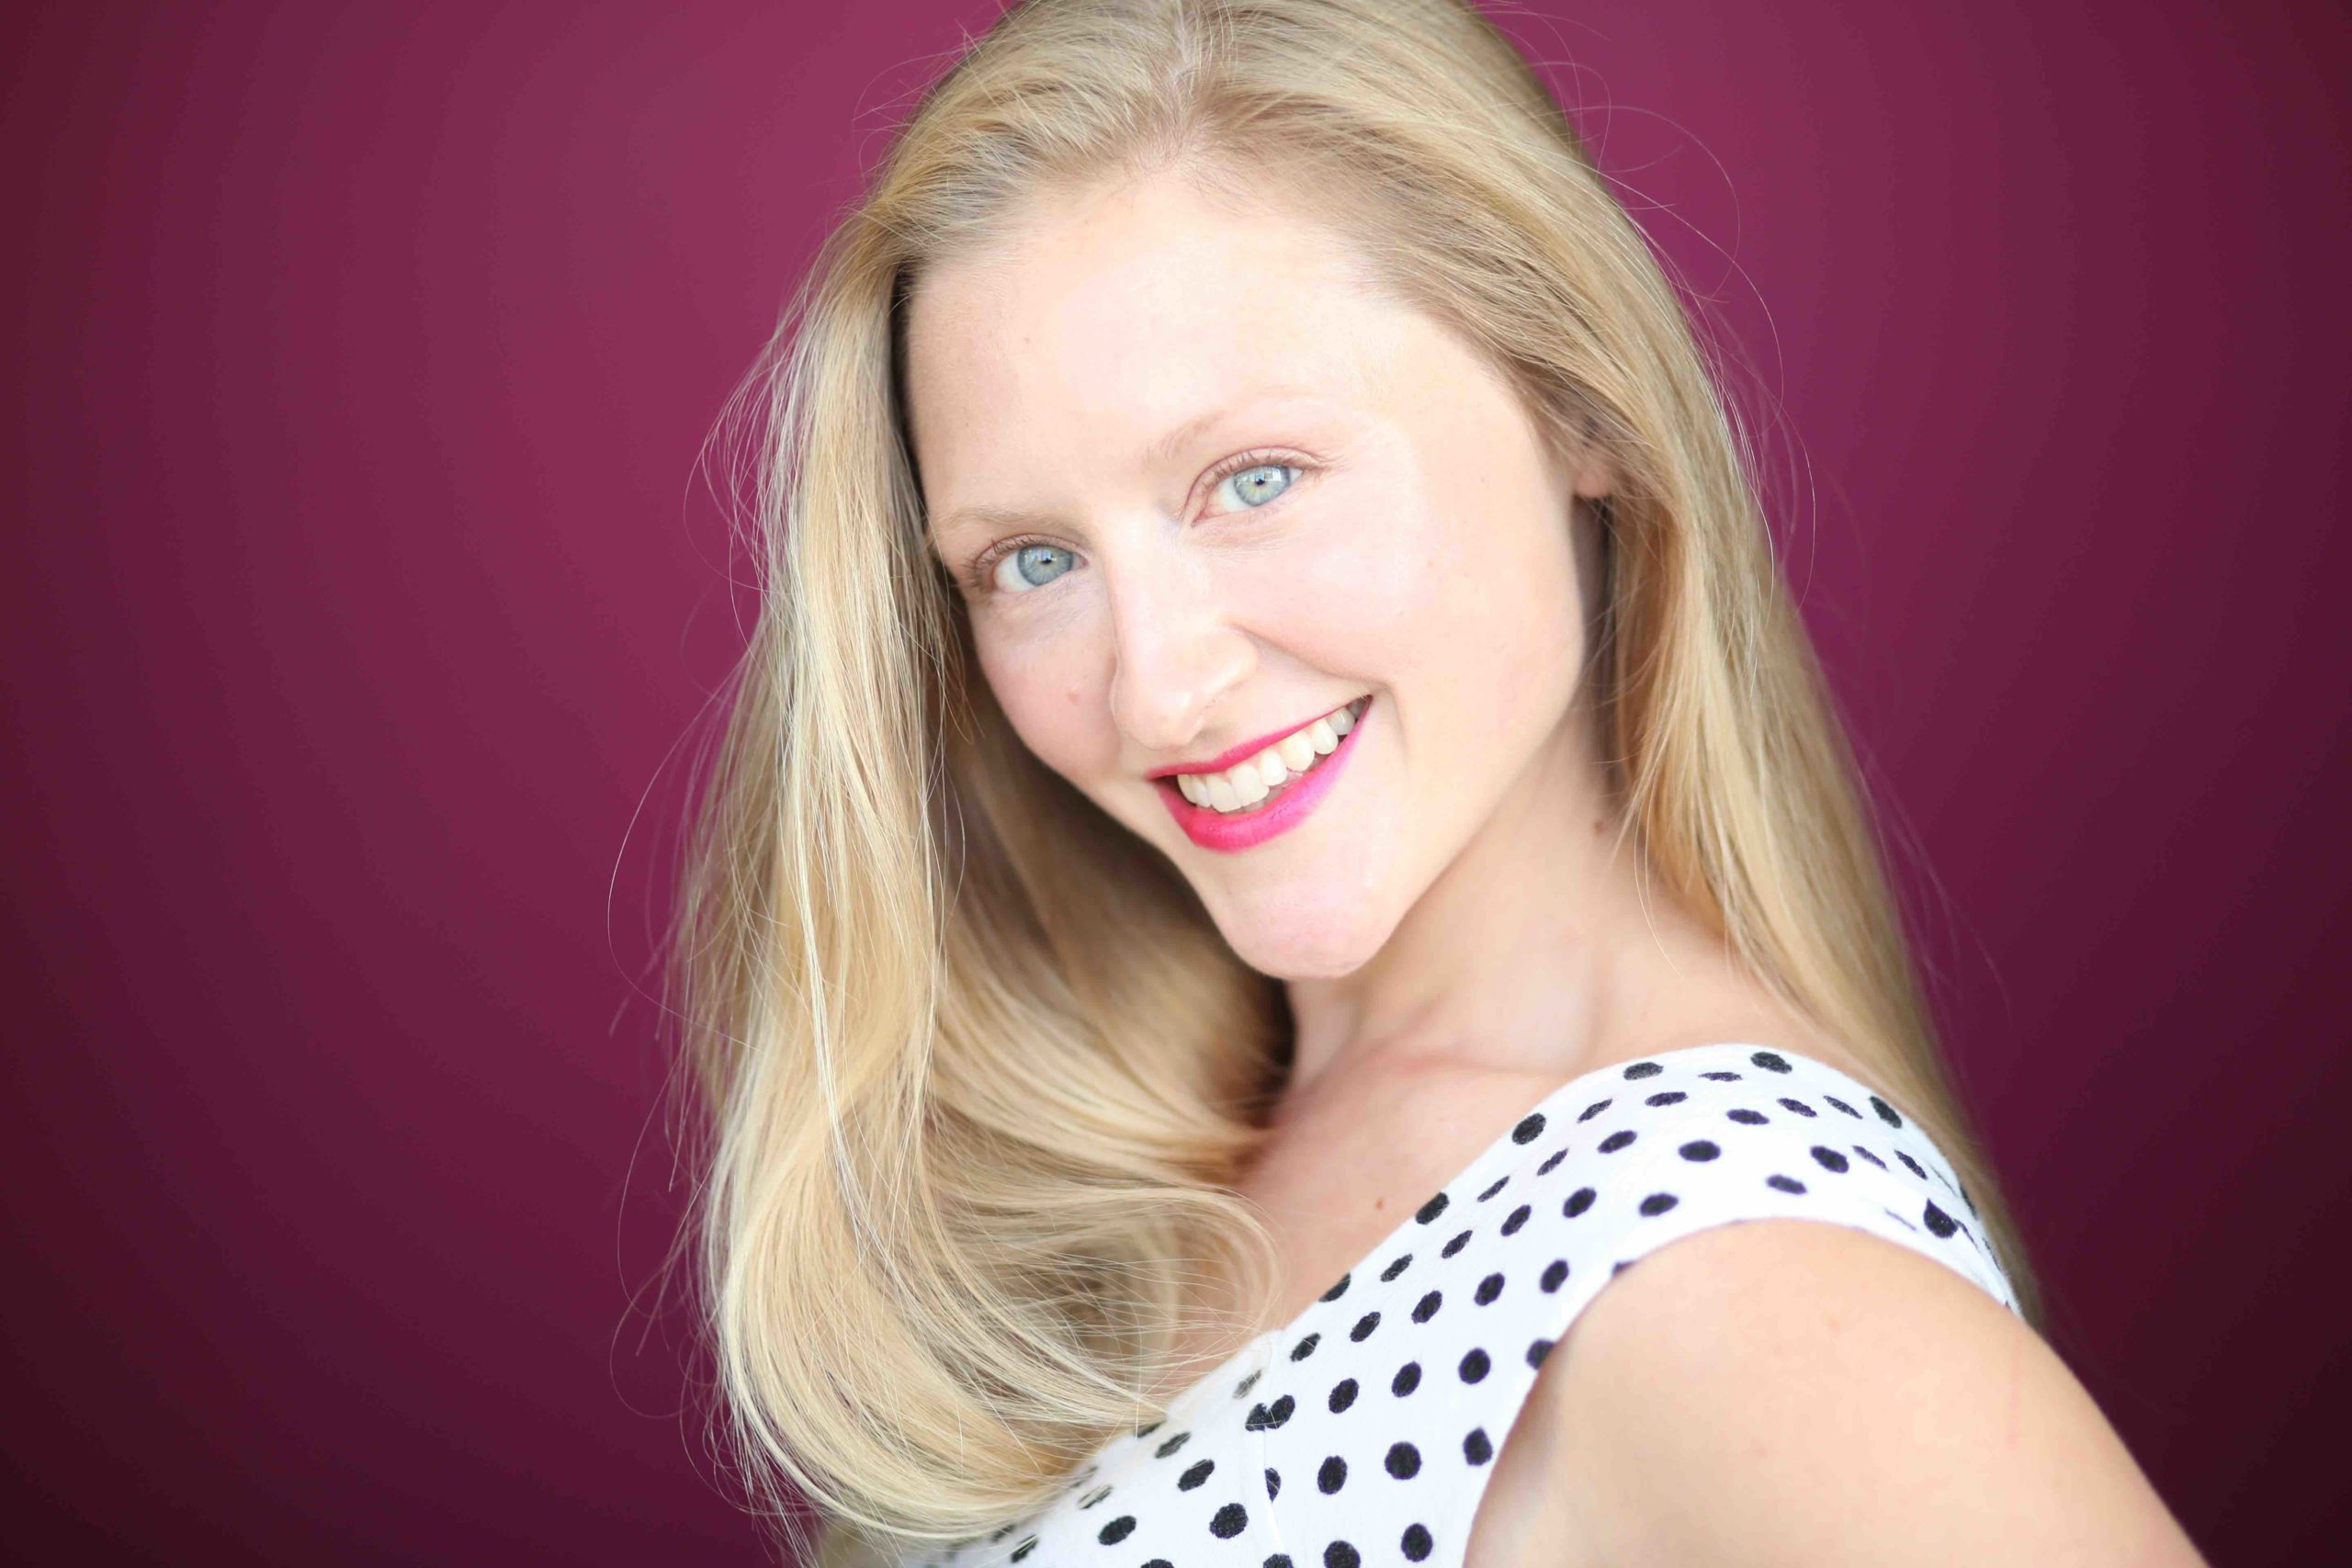 Sarah Hawkey Voice Studio | Voice Lessons in Redding, Weston, Ridgefield, Westport CT